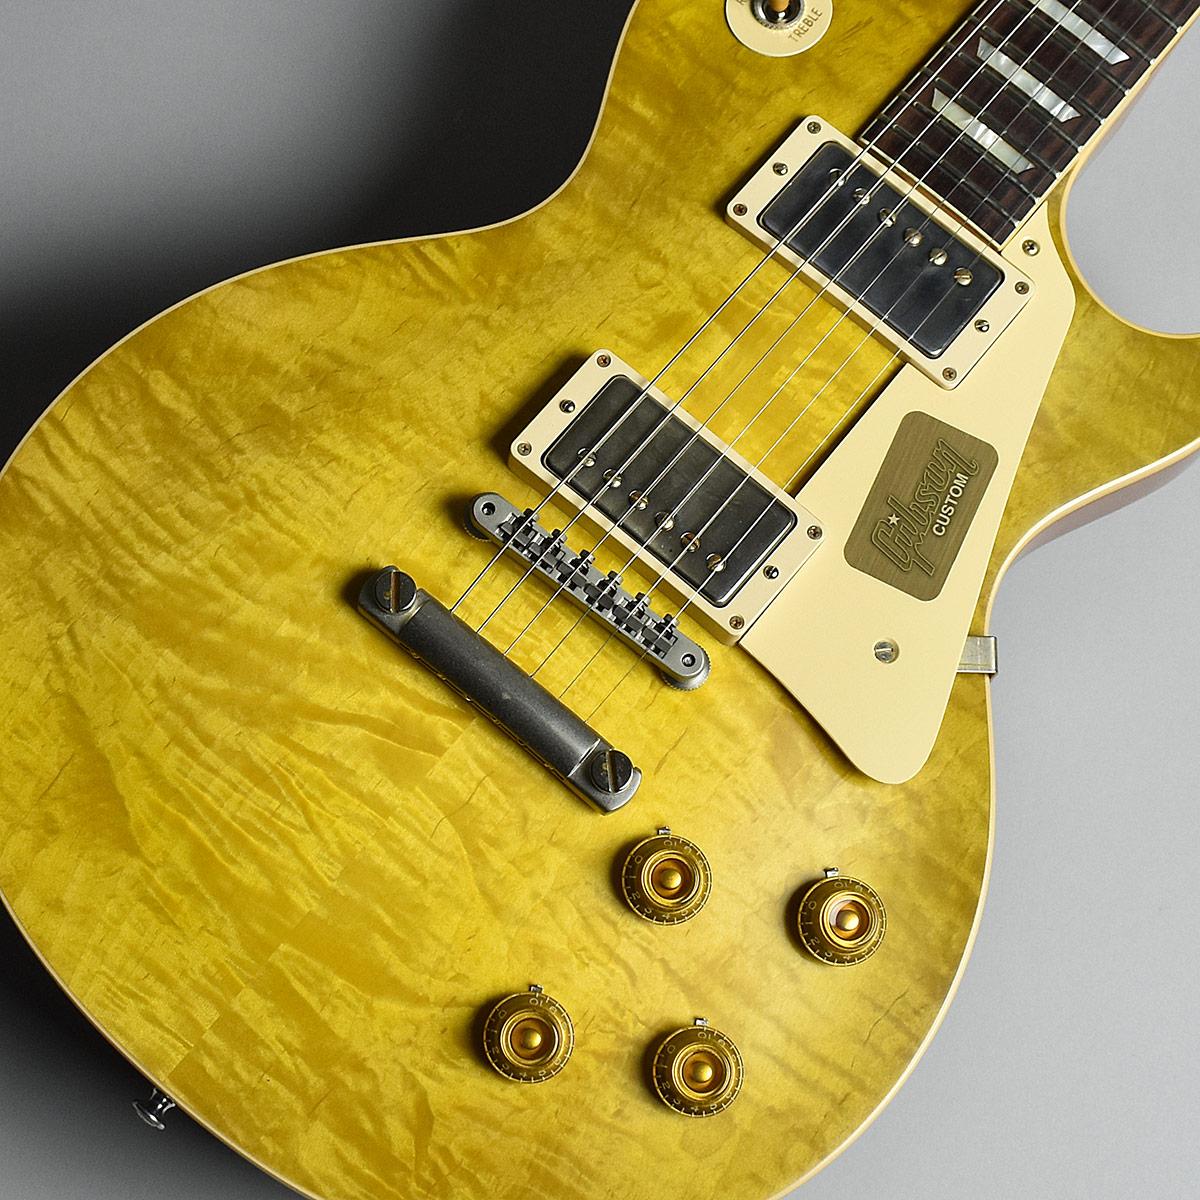 Gibson Custom Shop 1959 Les Paul Standard VOS Danger Burst S/N:971524 レスポール・スタンダード 【ギブソン カスタムショップ】【未展示品】